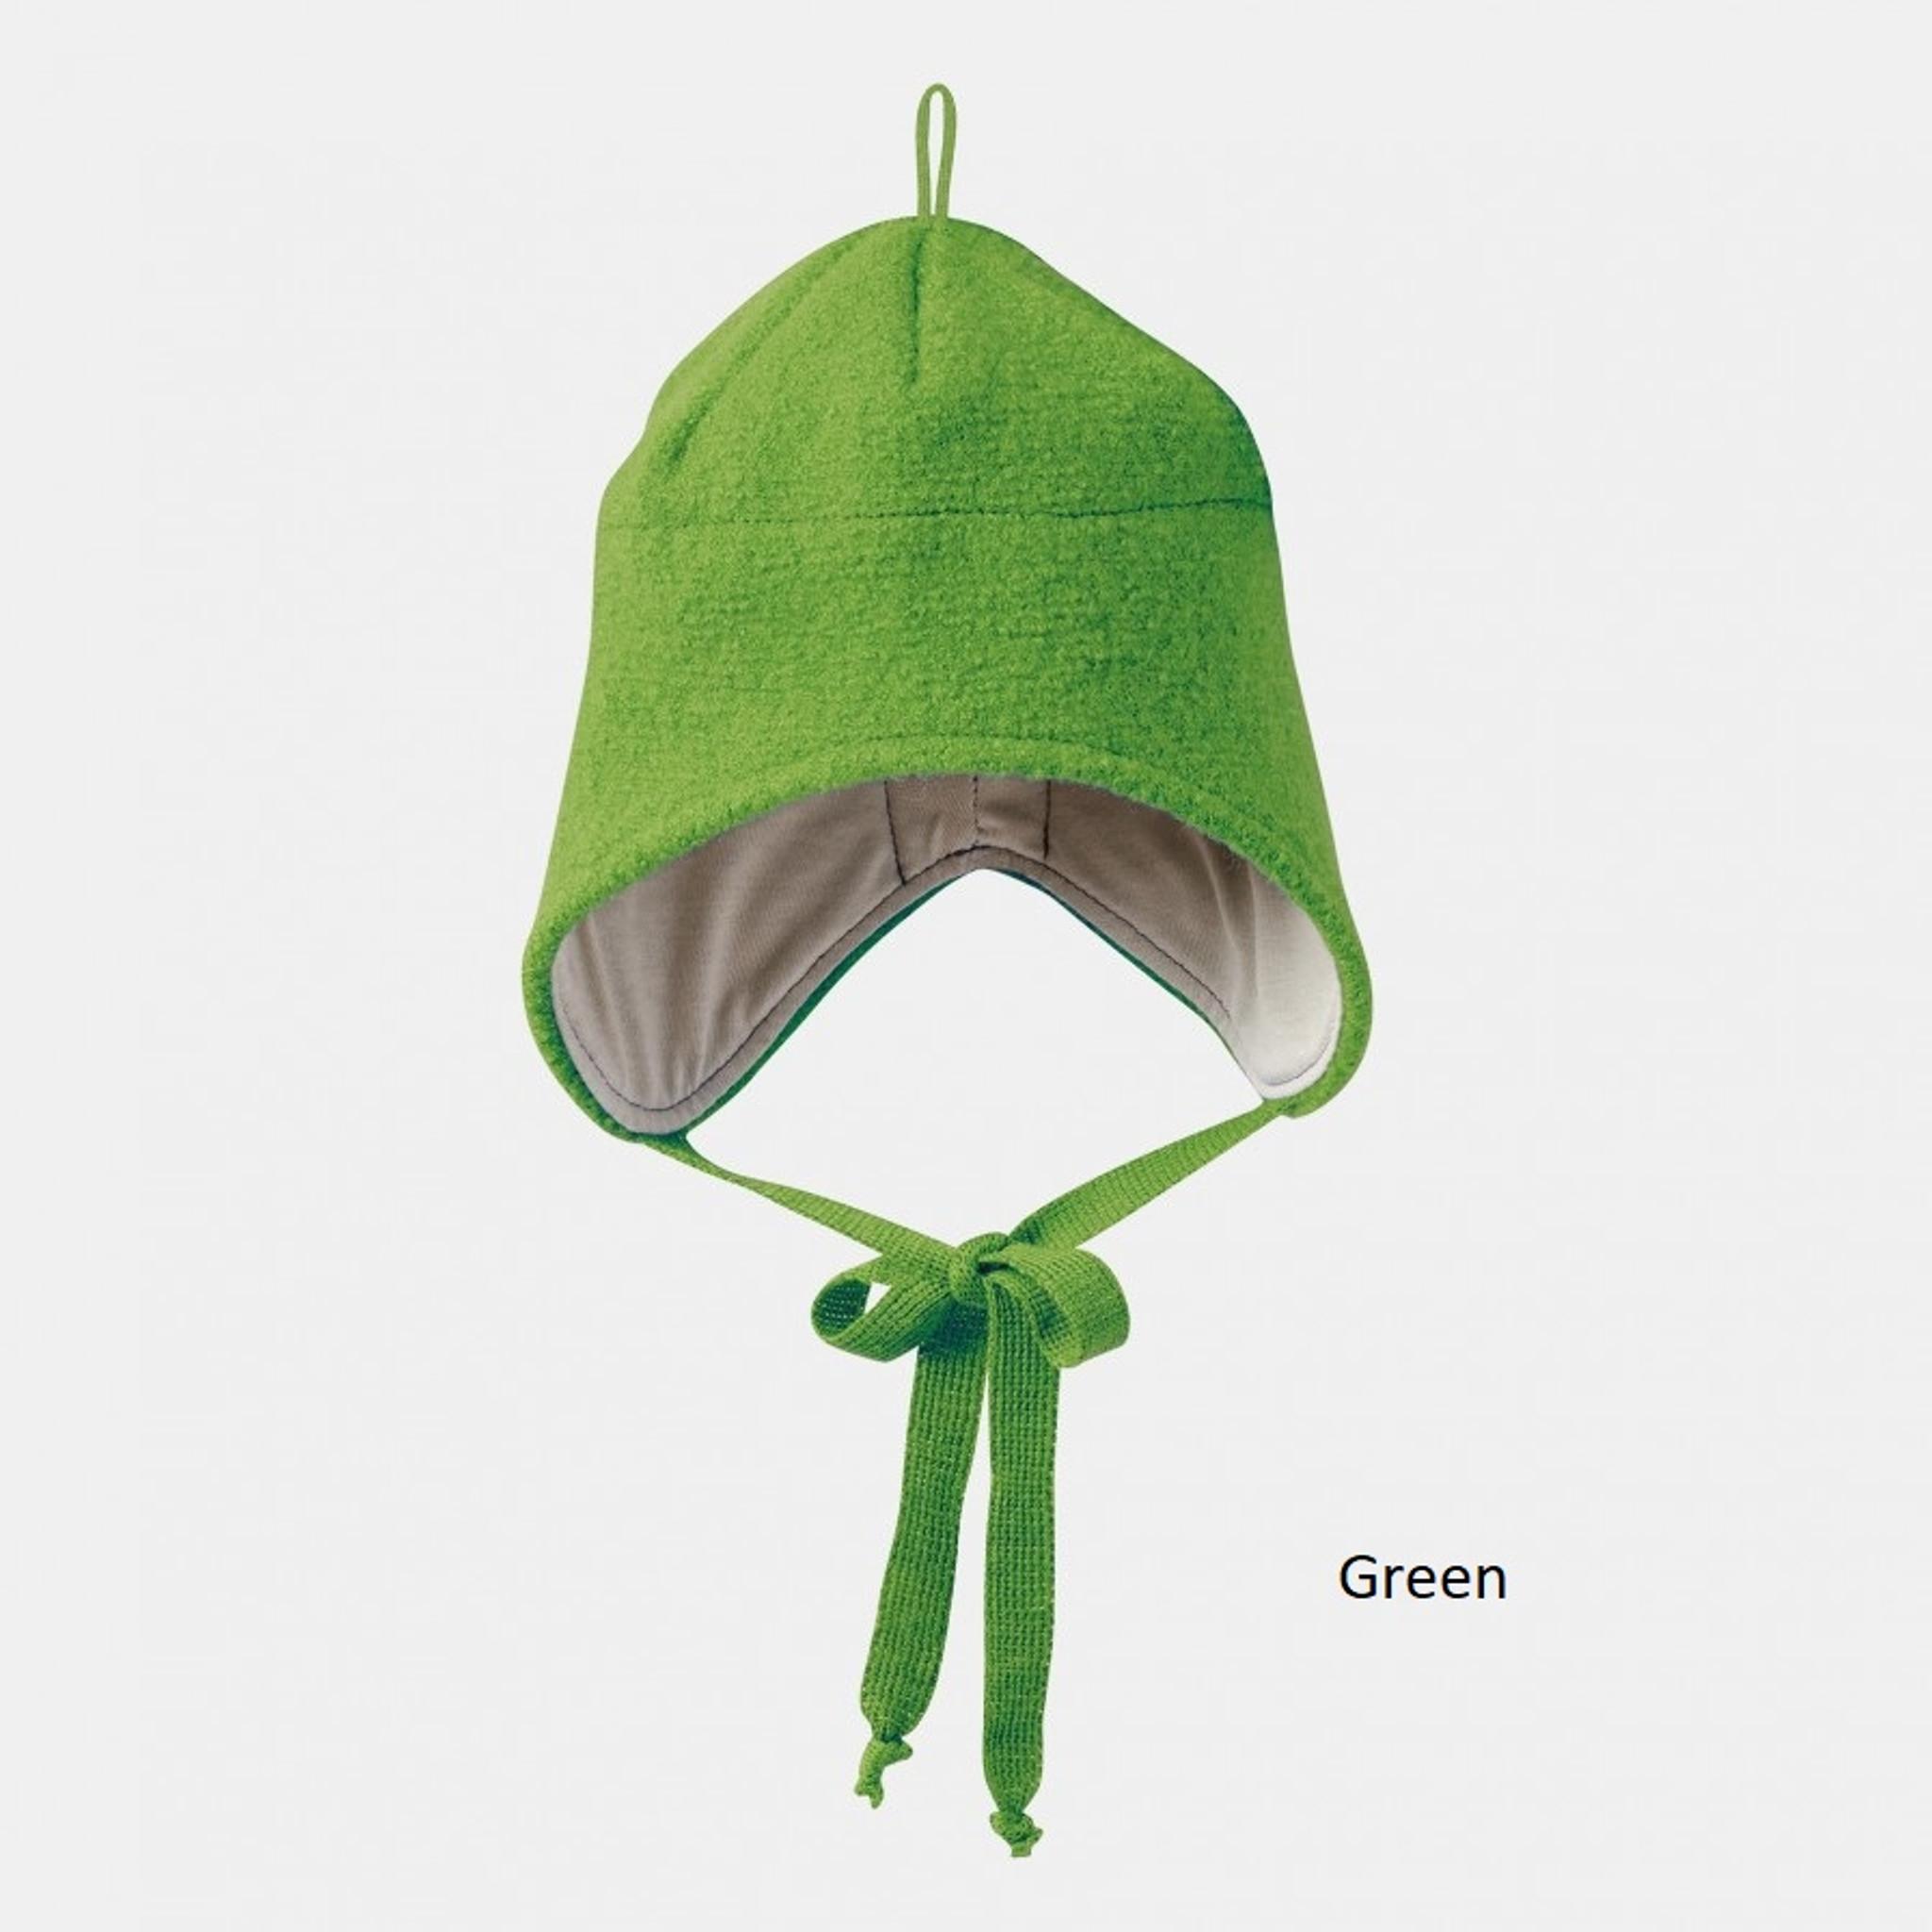 a8d71e3cc Disana Boiled Wool Hat - Disana Canada - Merino Wool Clothing for ...